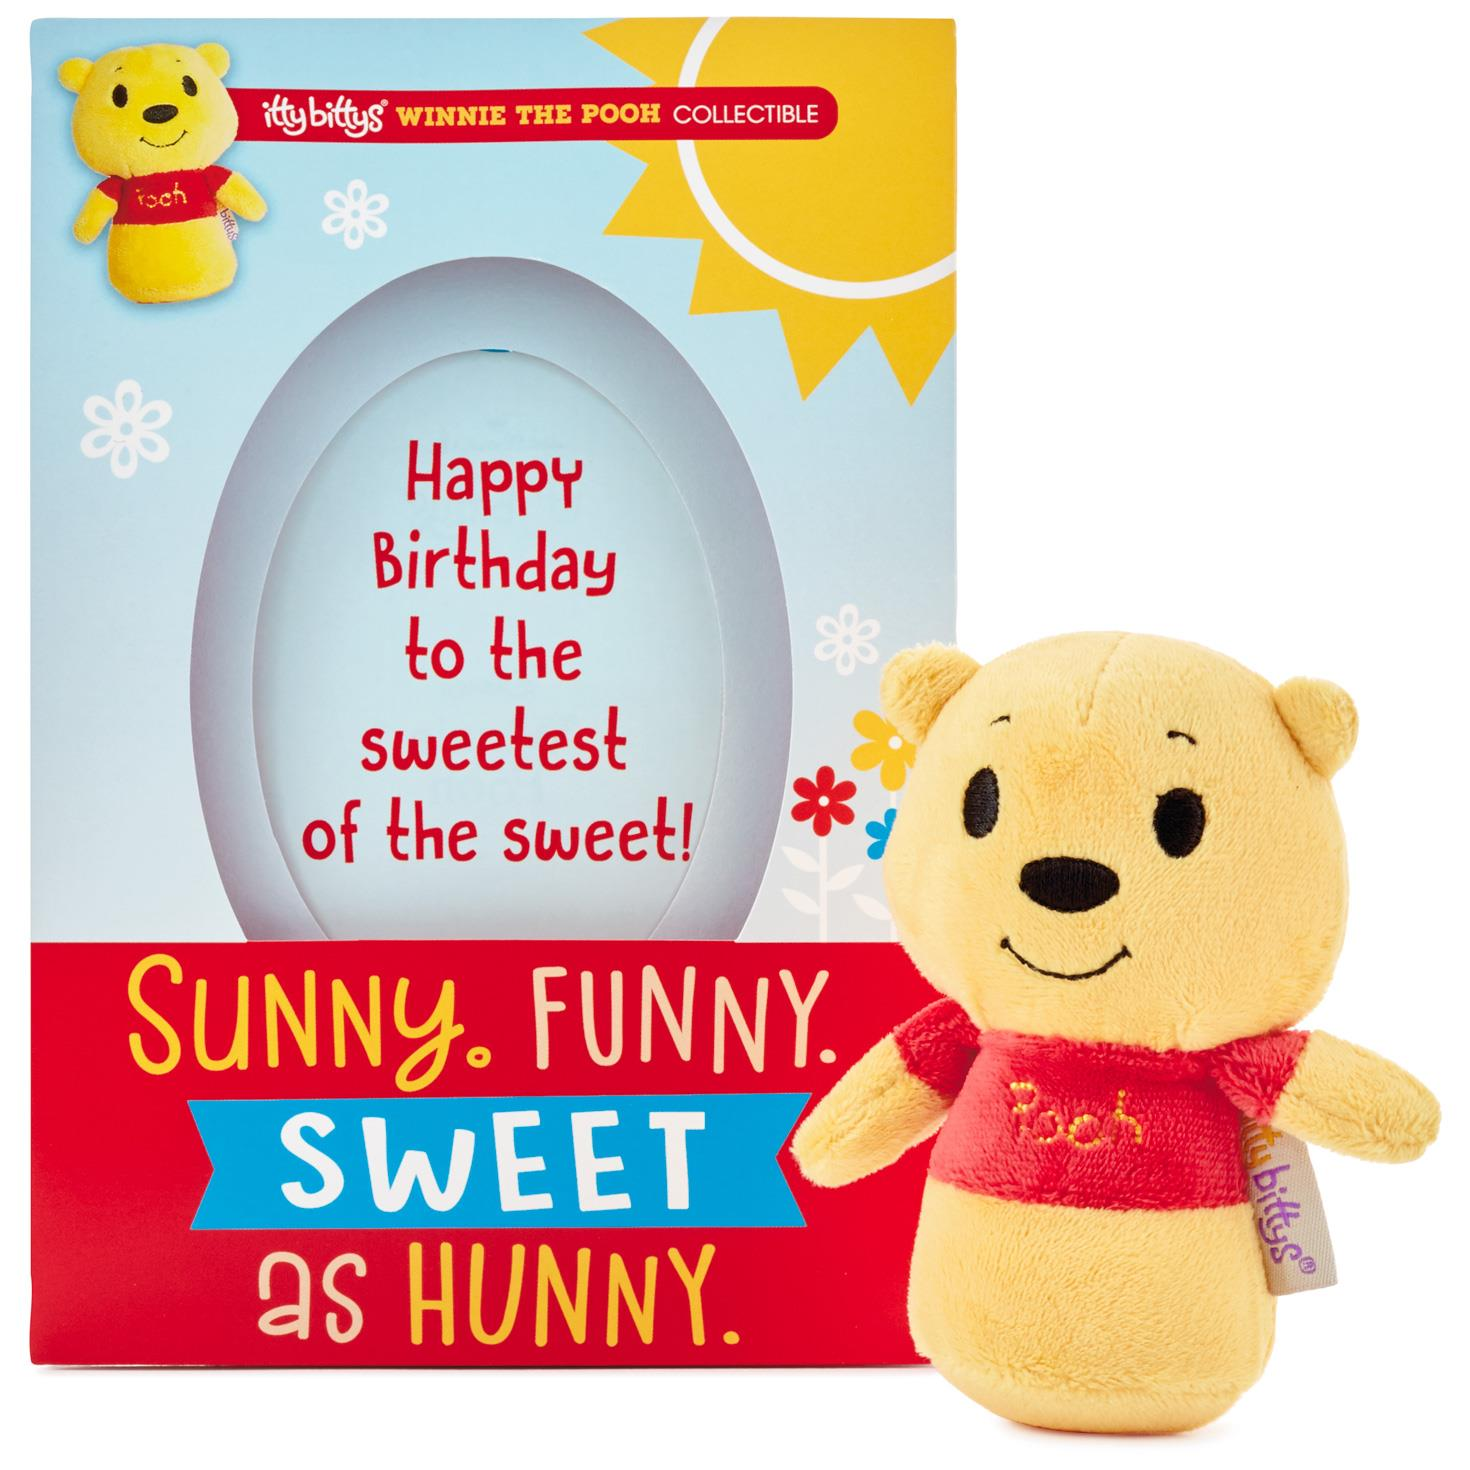 itty bittyswinnie the pooh birthday card with stuffed animal